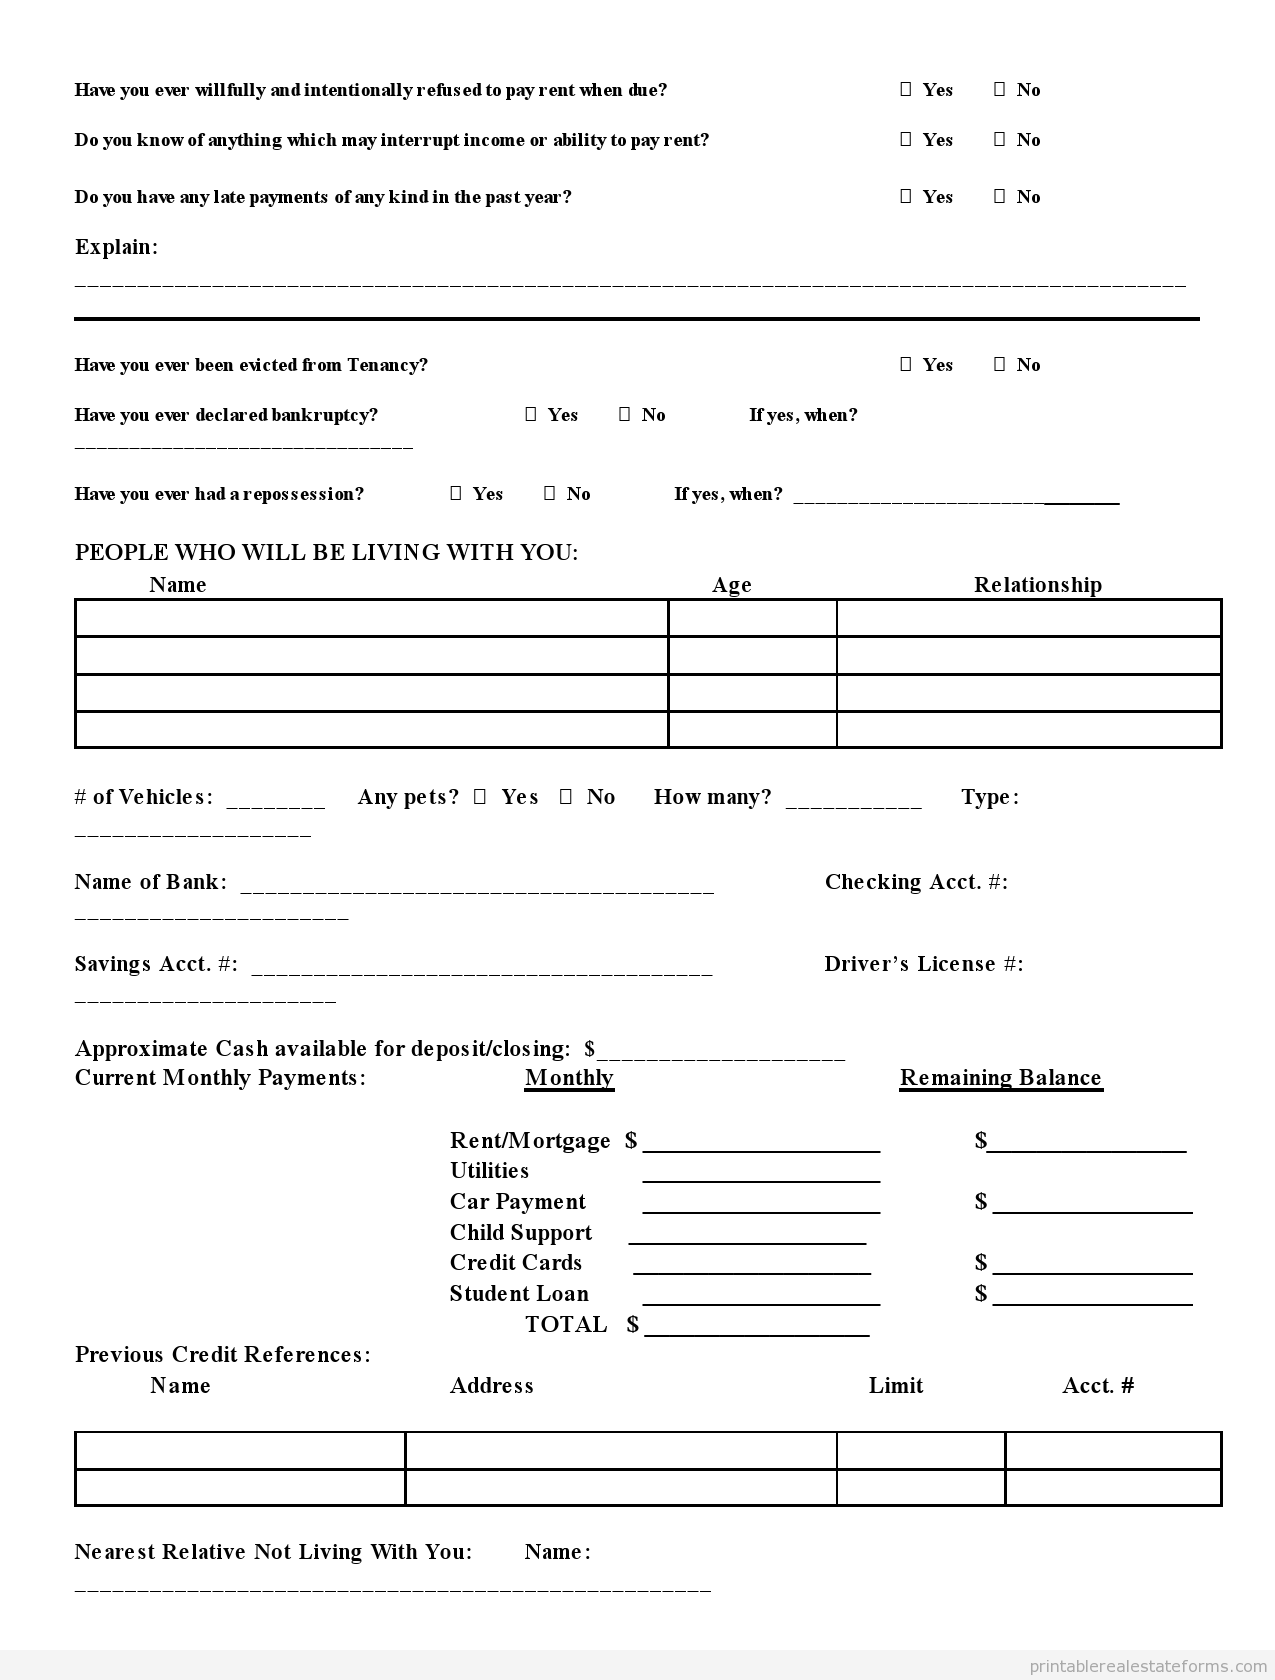 Printable Preliminary Credit Application Template